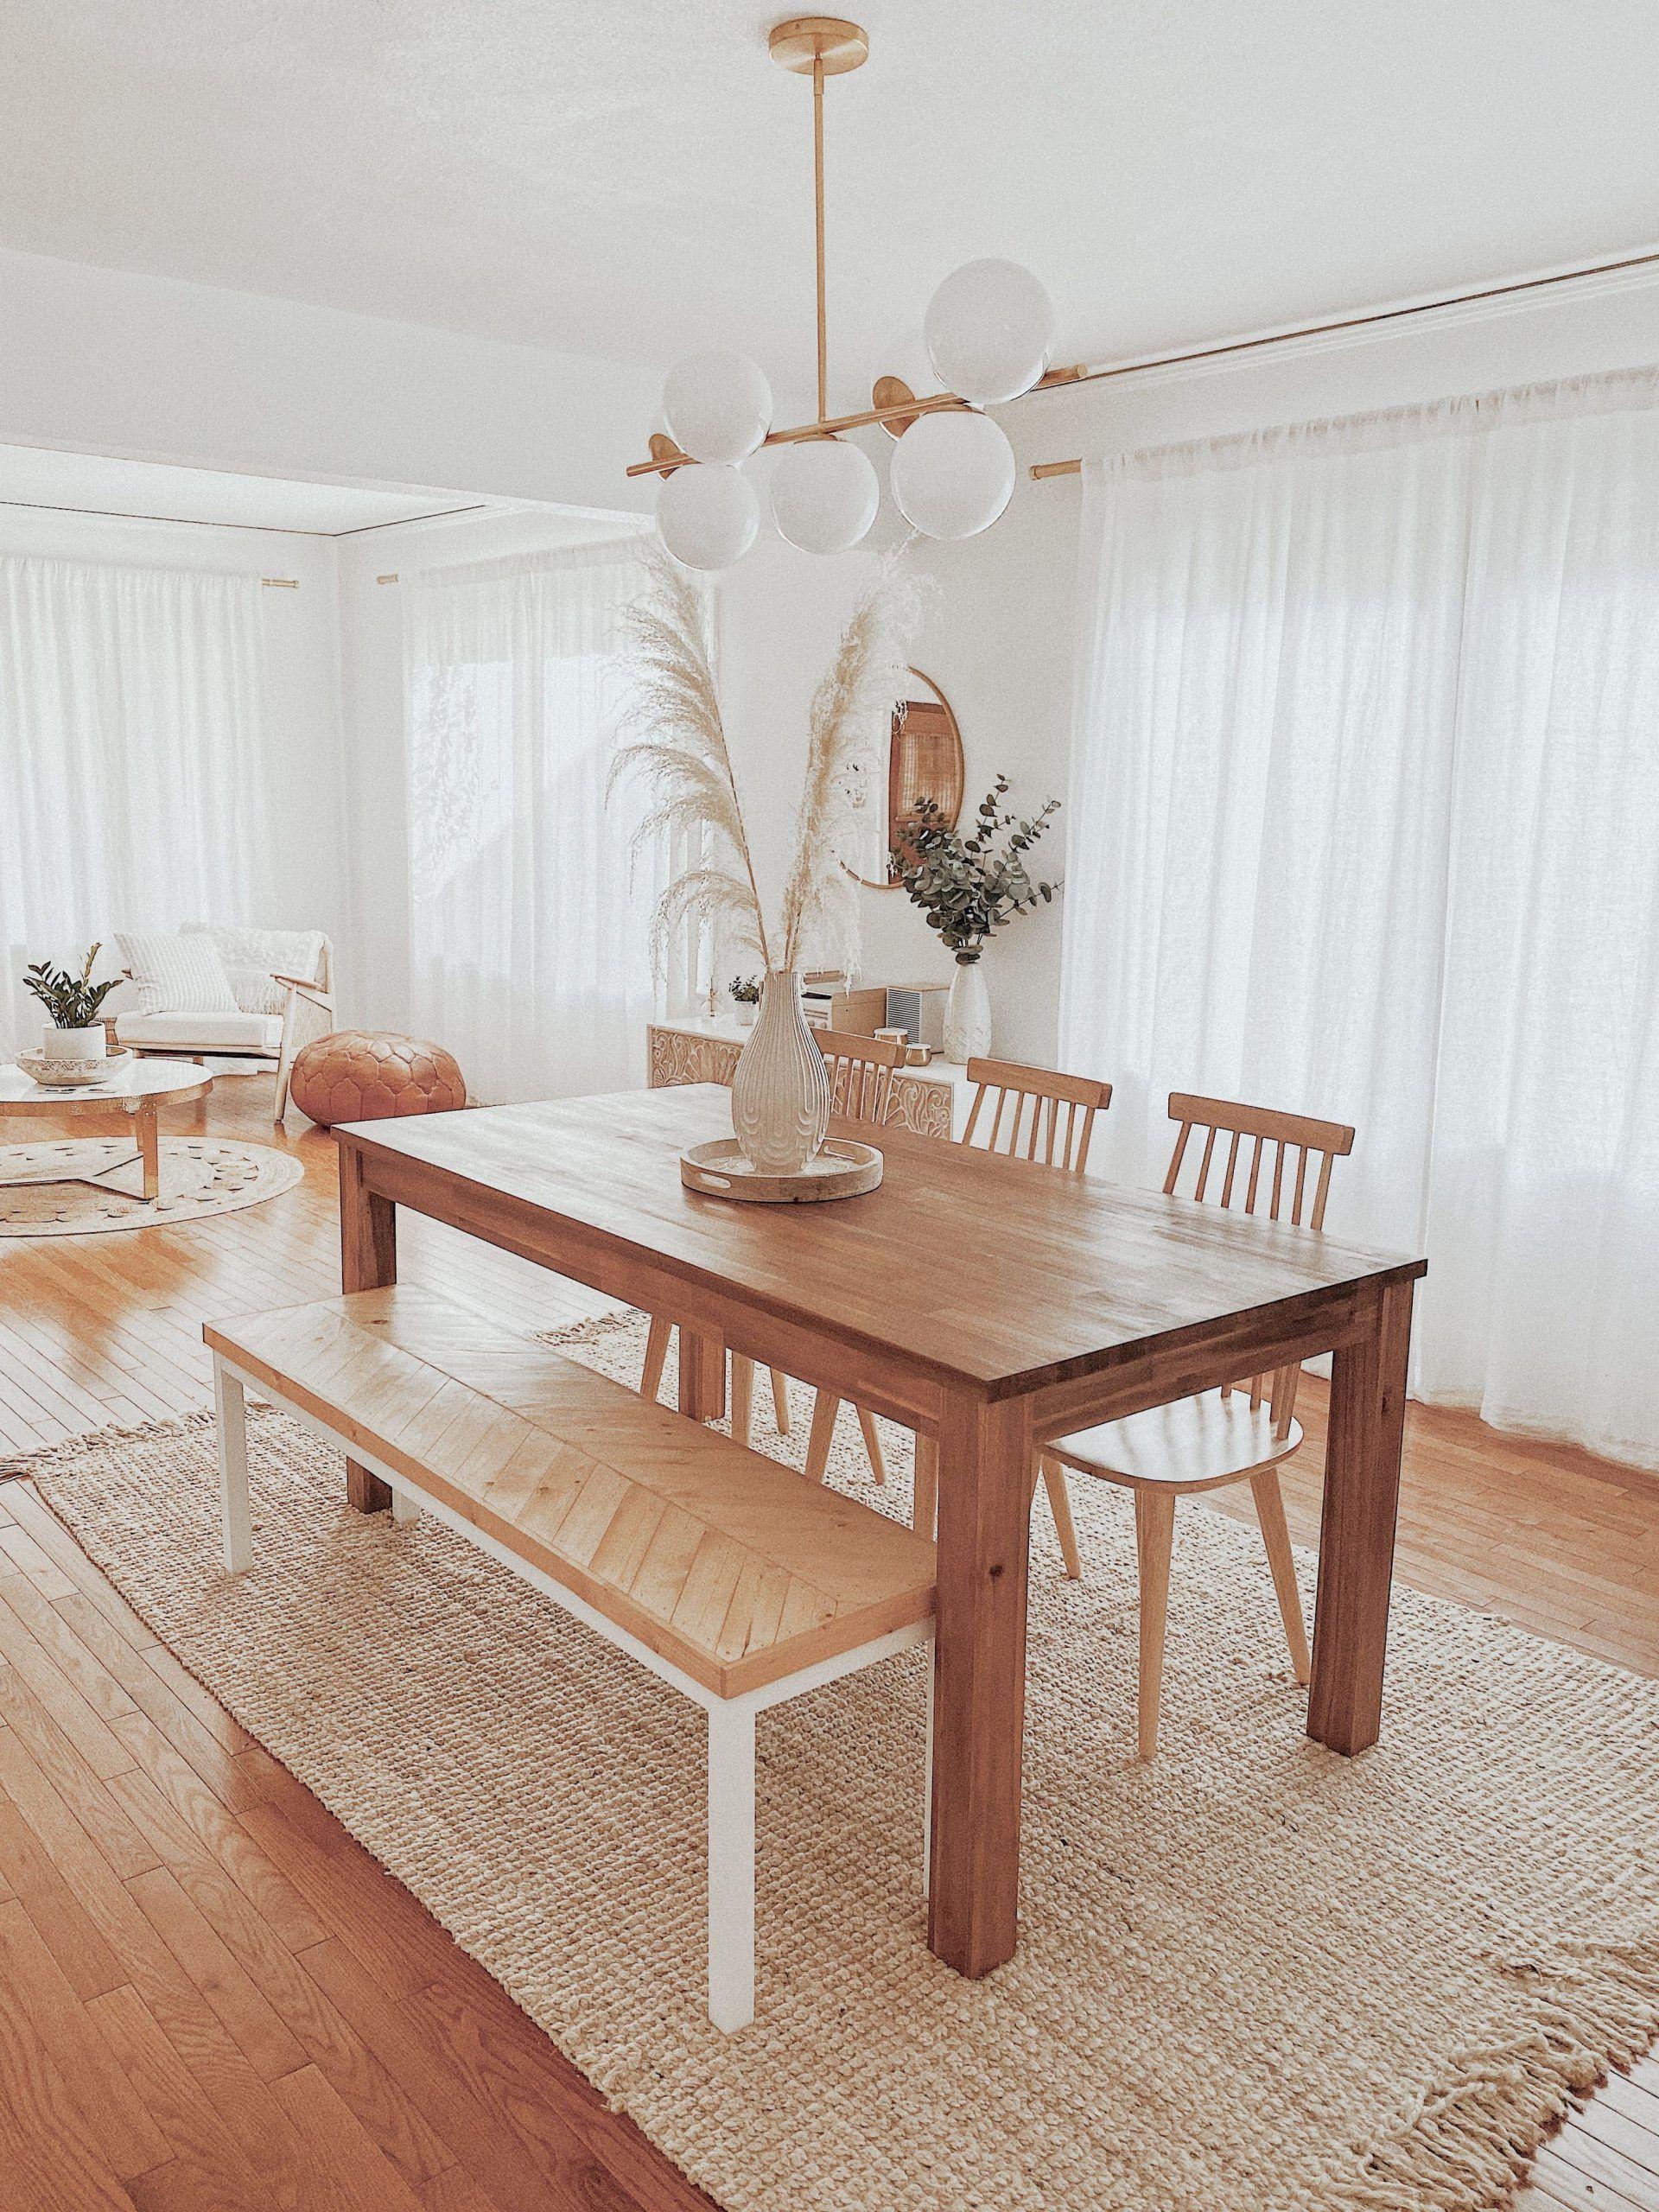 Boho Bohemian White Wood Cozy Dining Room Living Space ...